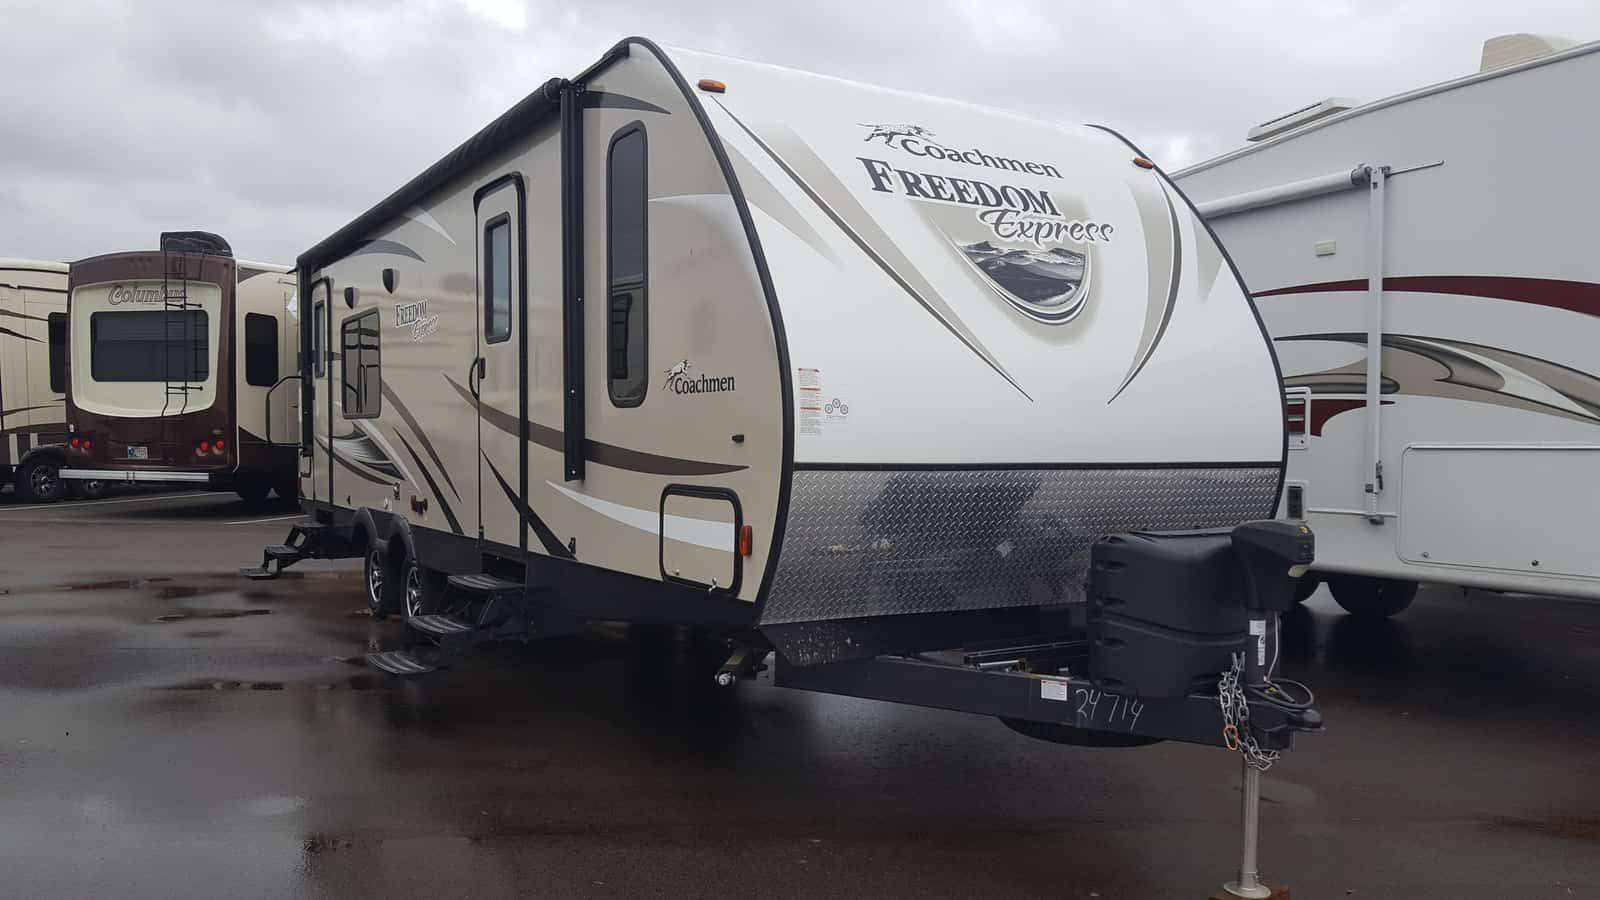 USED 2017 Coachmen FREEDOM EXPRESS 276RKDS - American RV